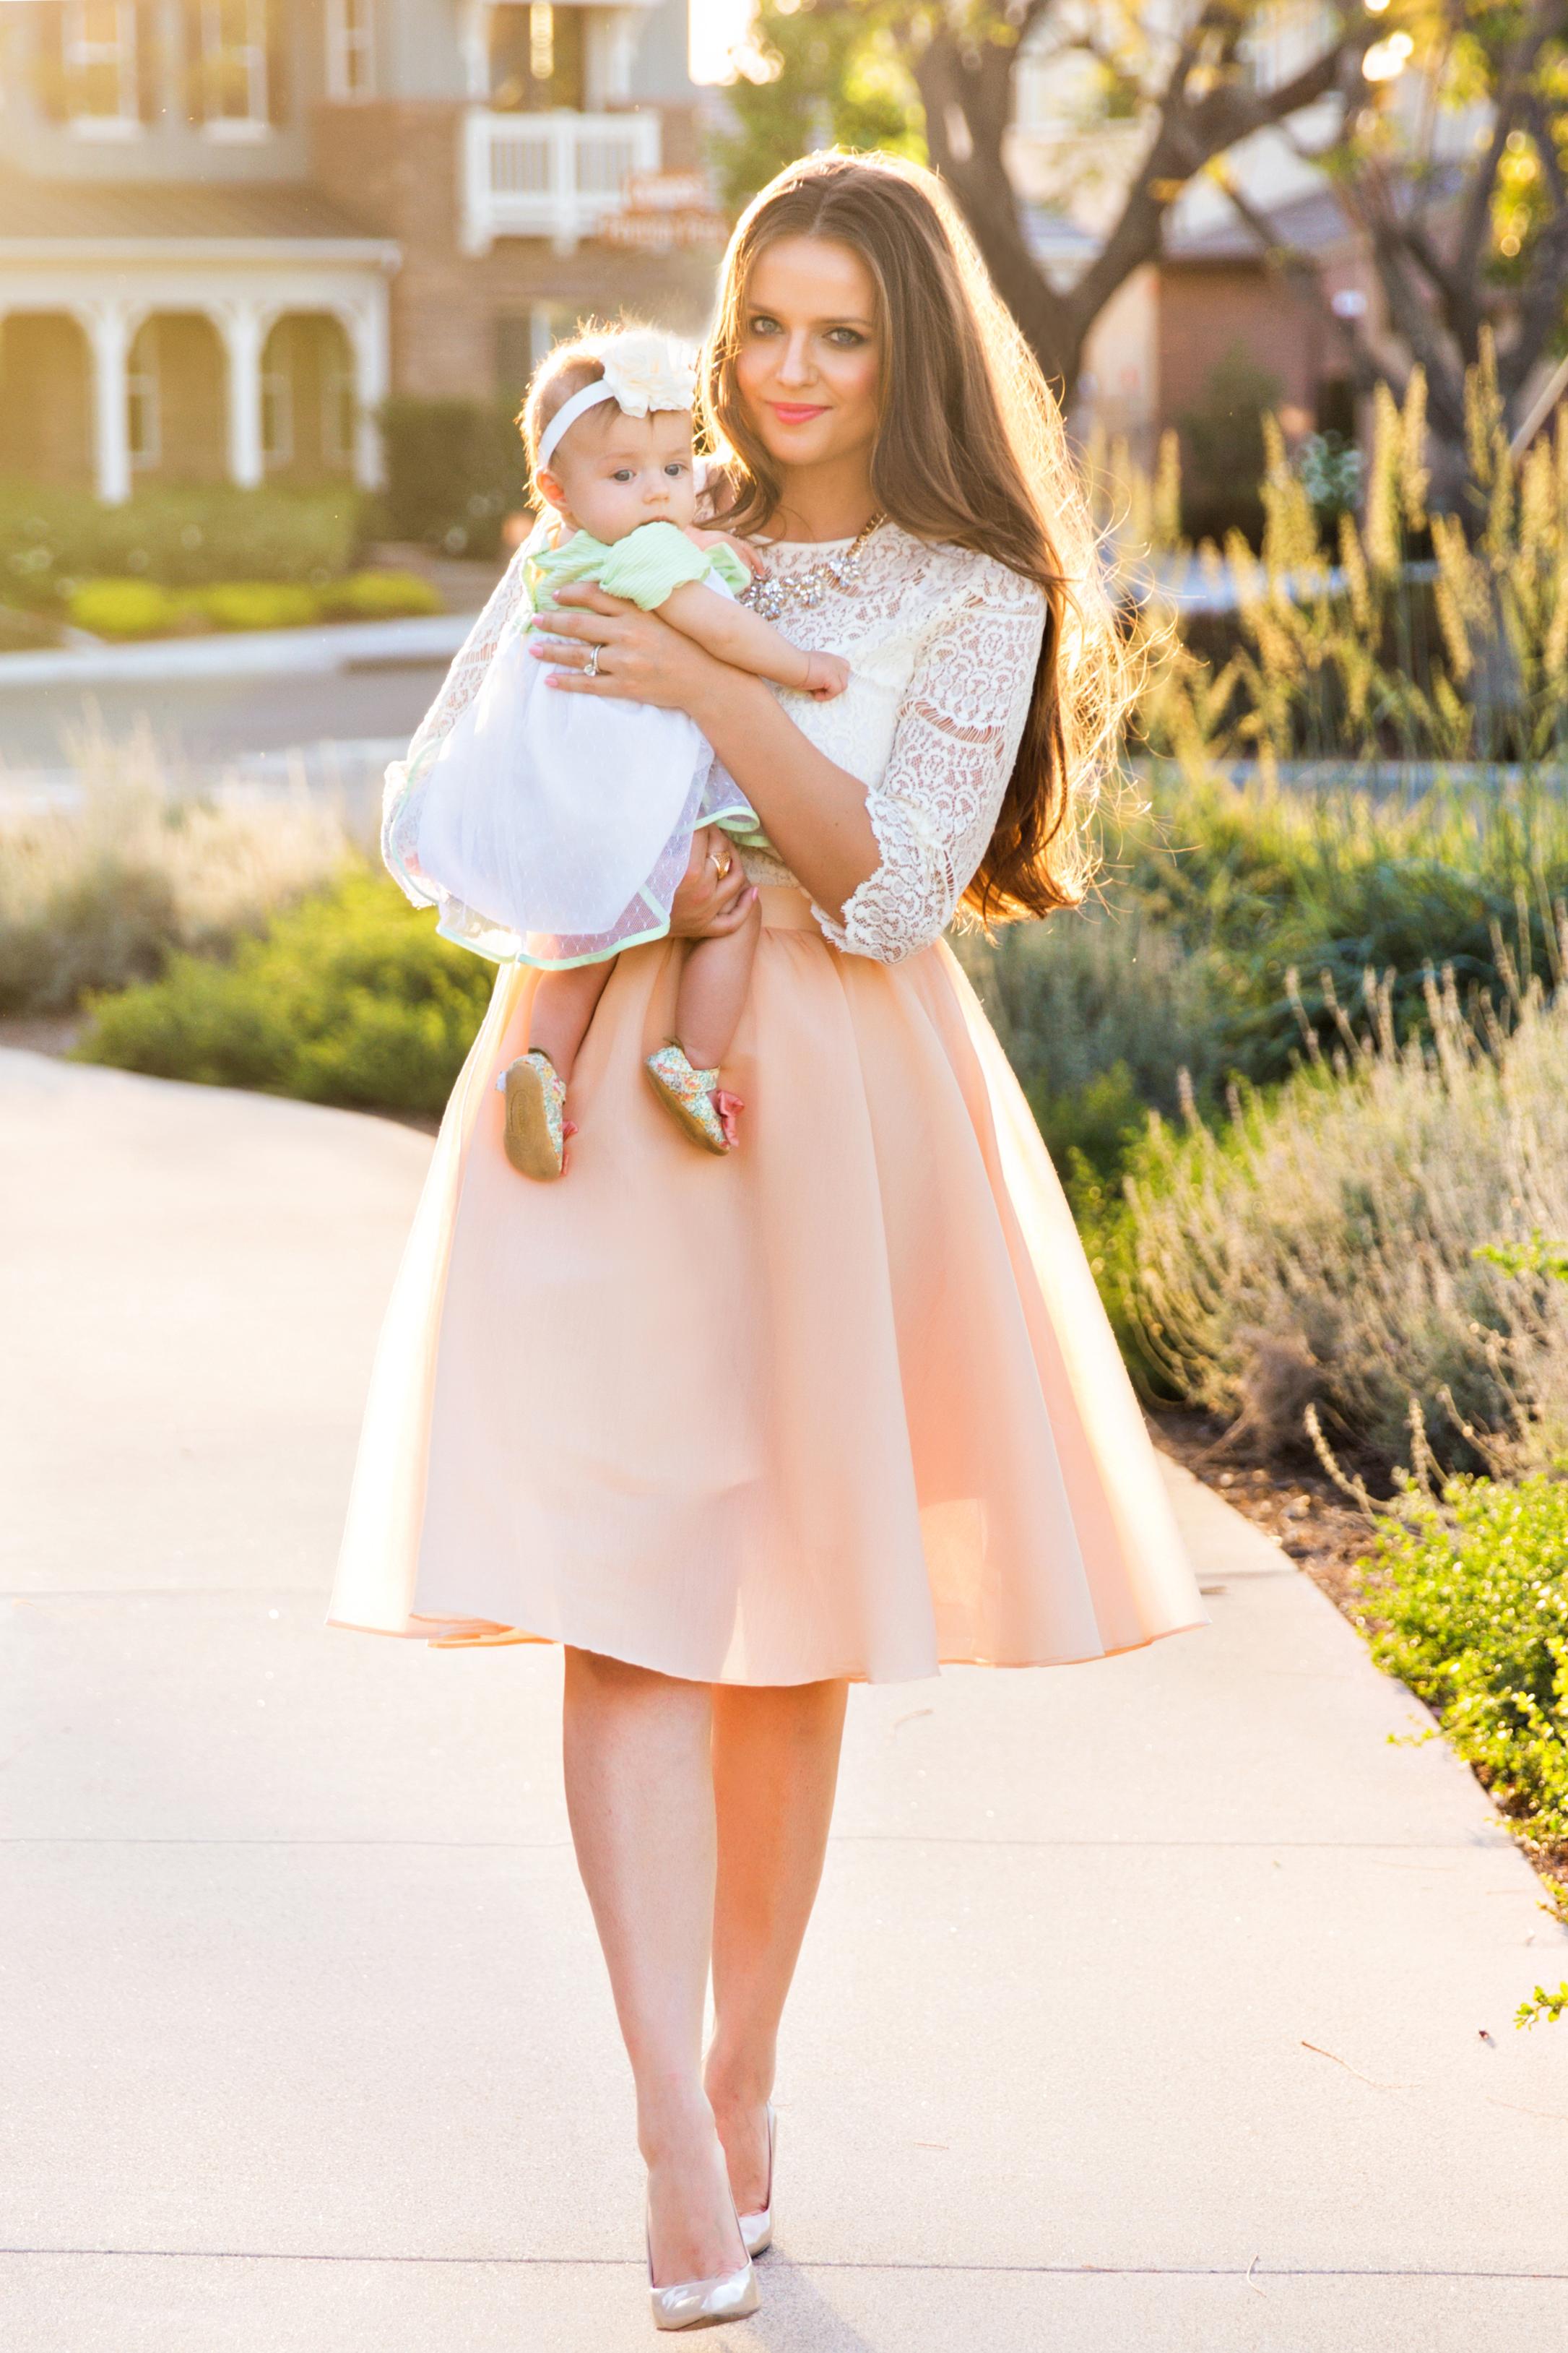 OOTD // Lace Top & Peach Midi Skirt | BondGirlGlam.com